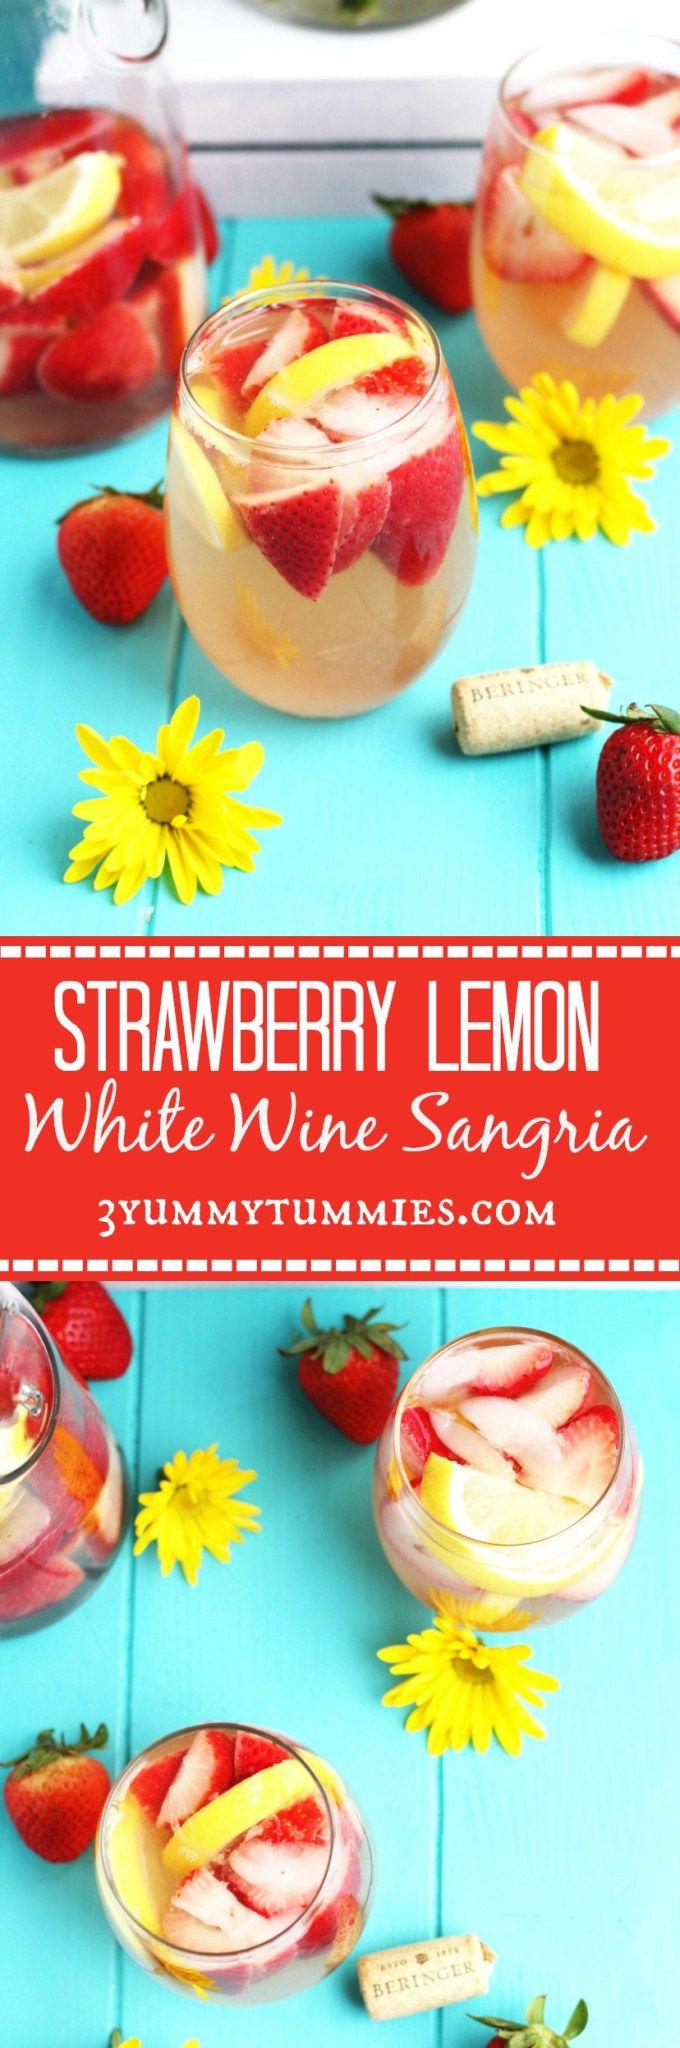 Strawberry Lemon White Wine Sangria White Wine Sangria Strawberry Lemon Lemon Sangria